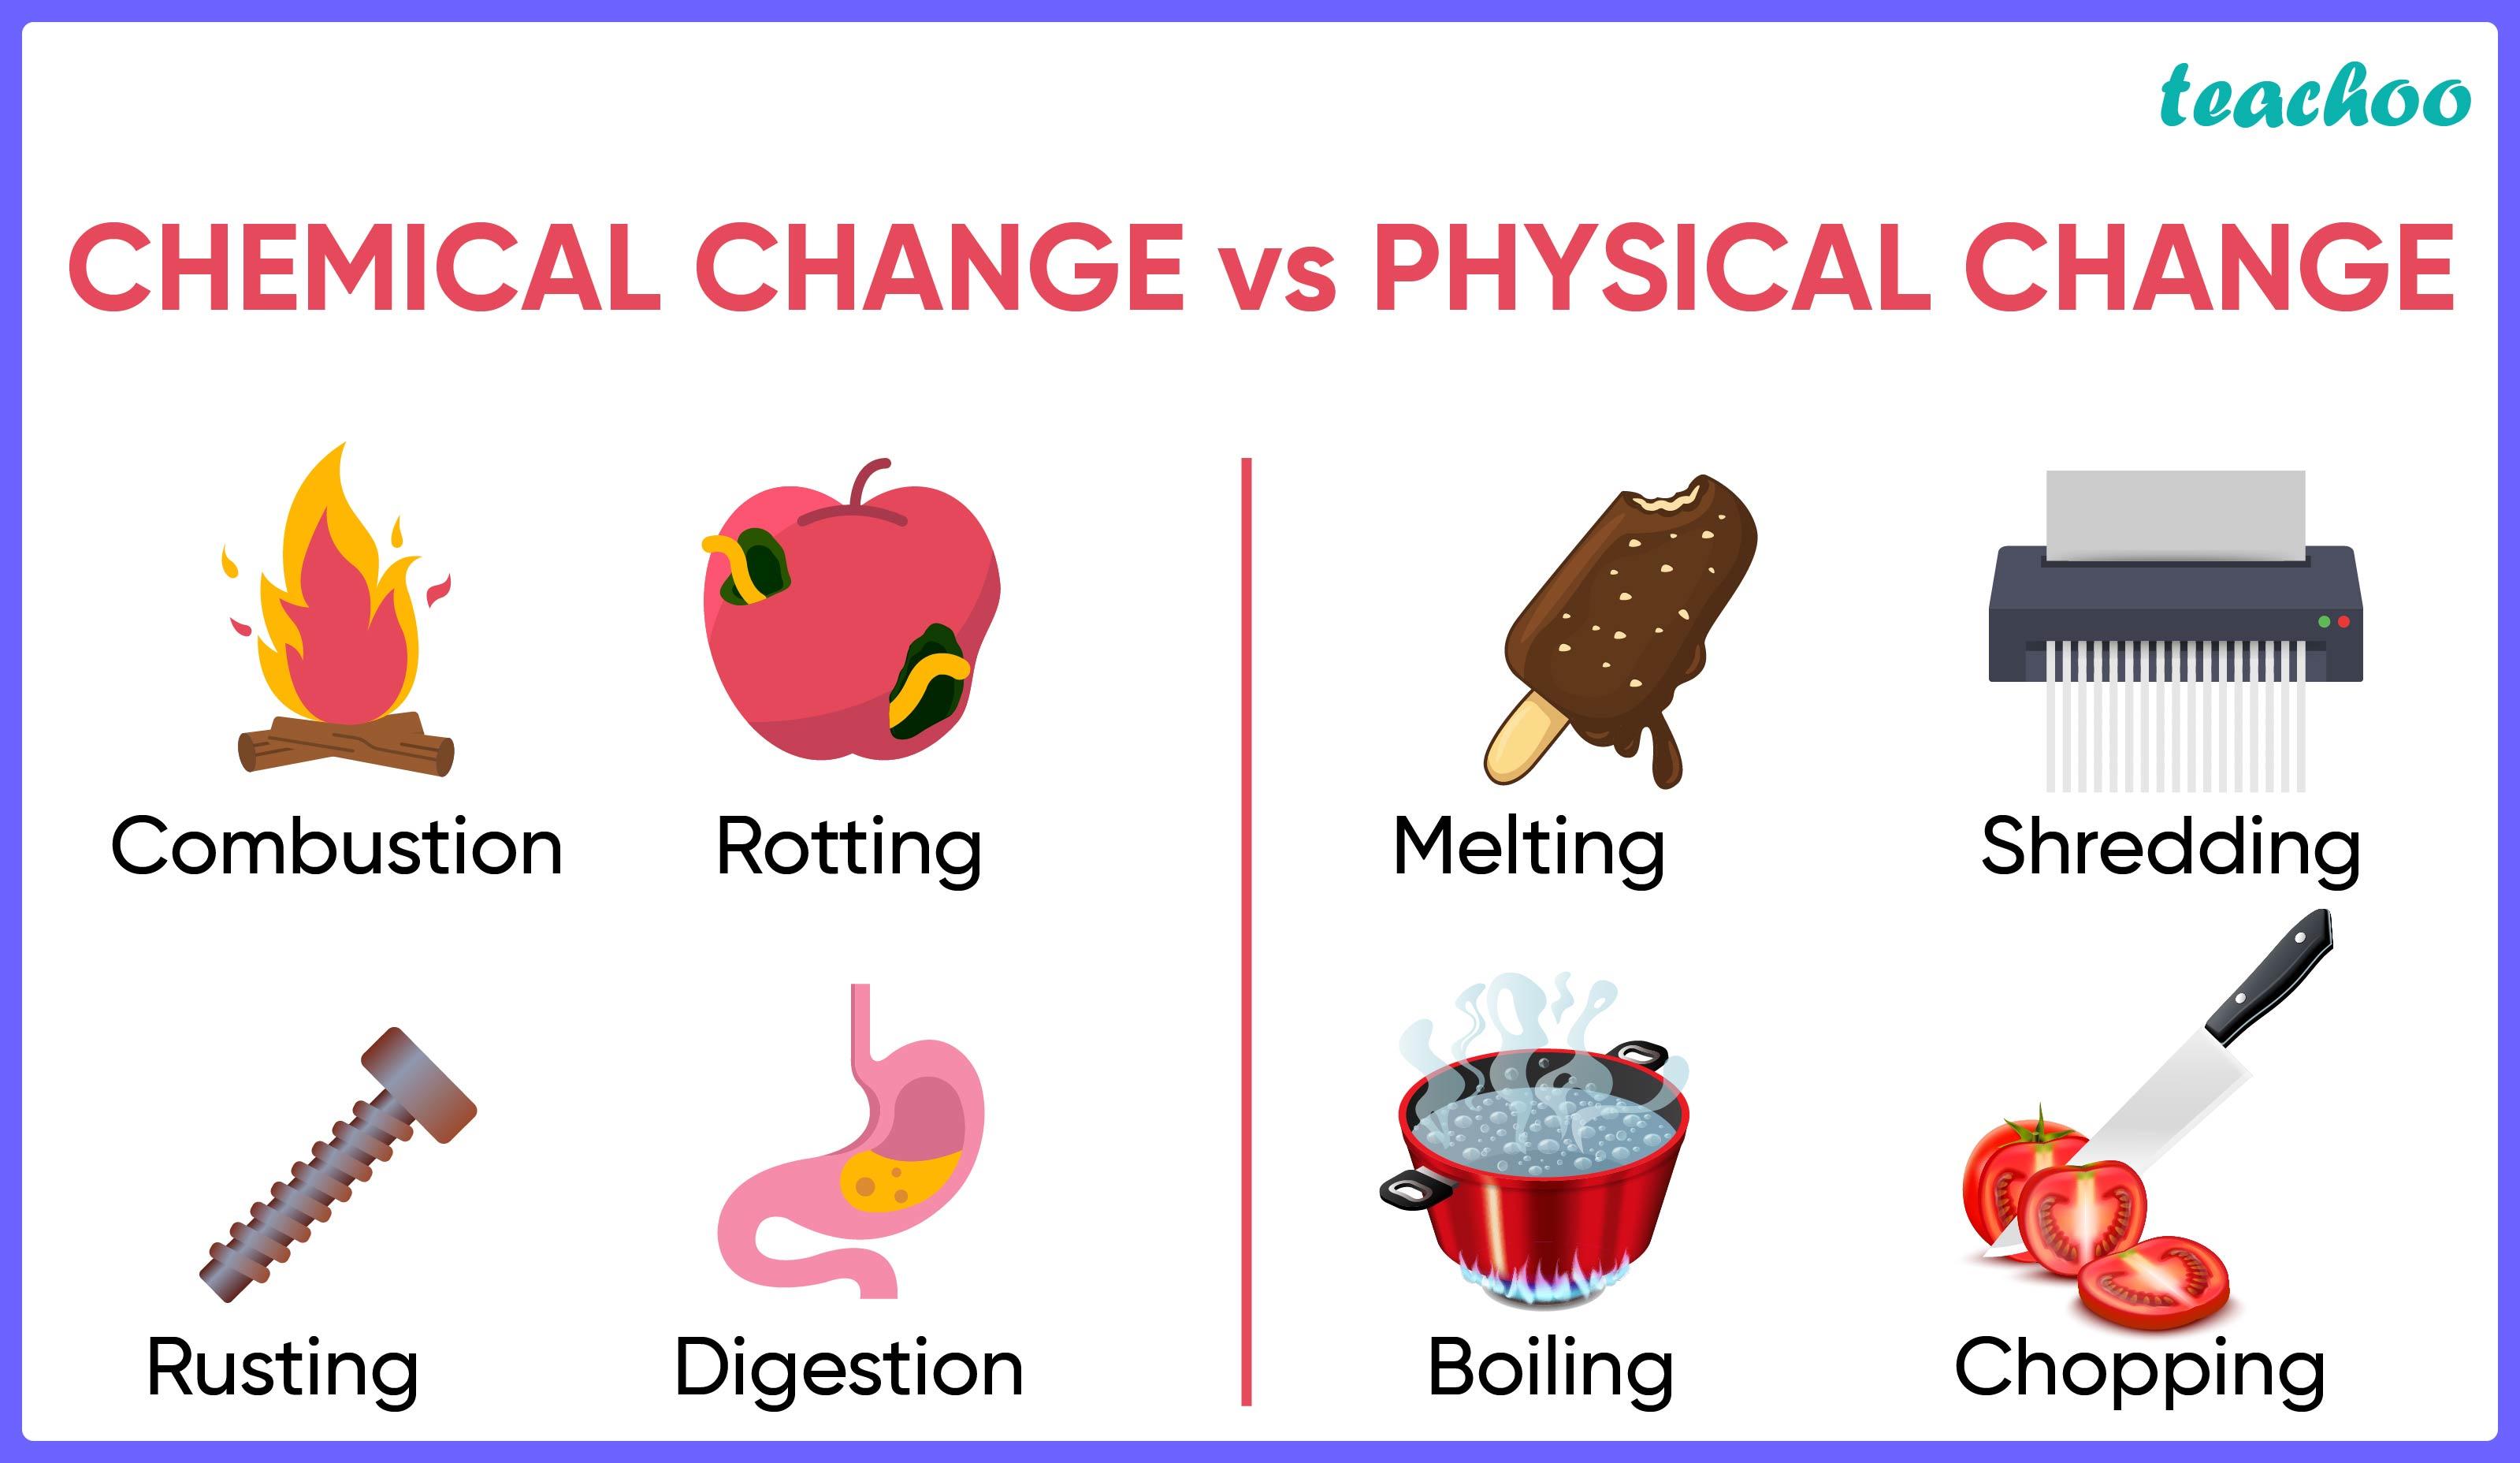 Chemical Change vs Physical Change-01.jpg